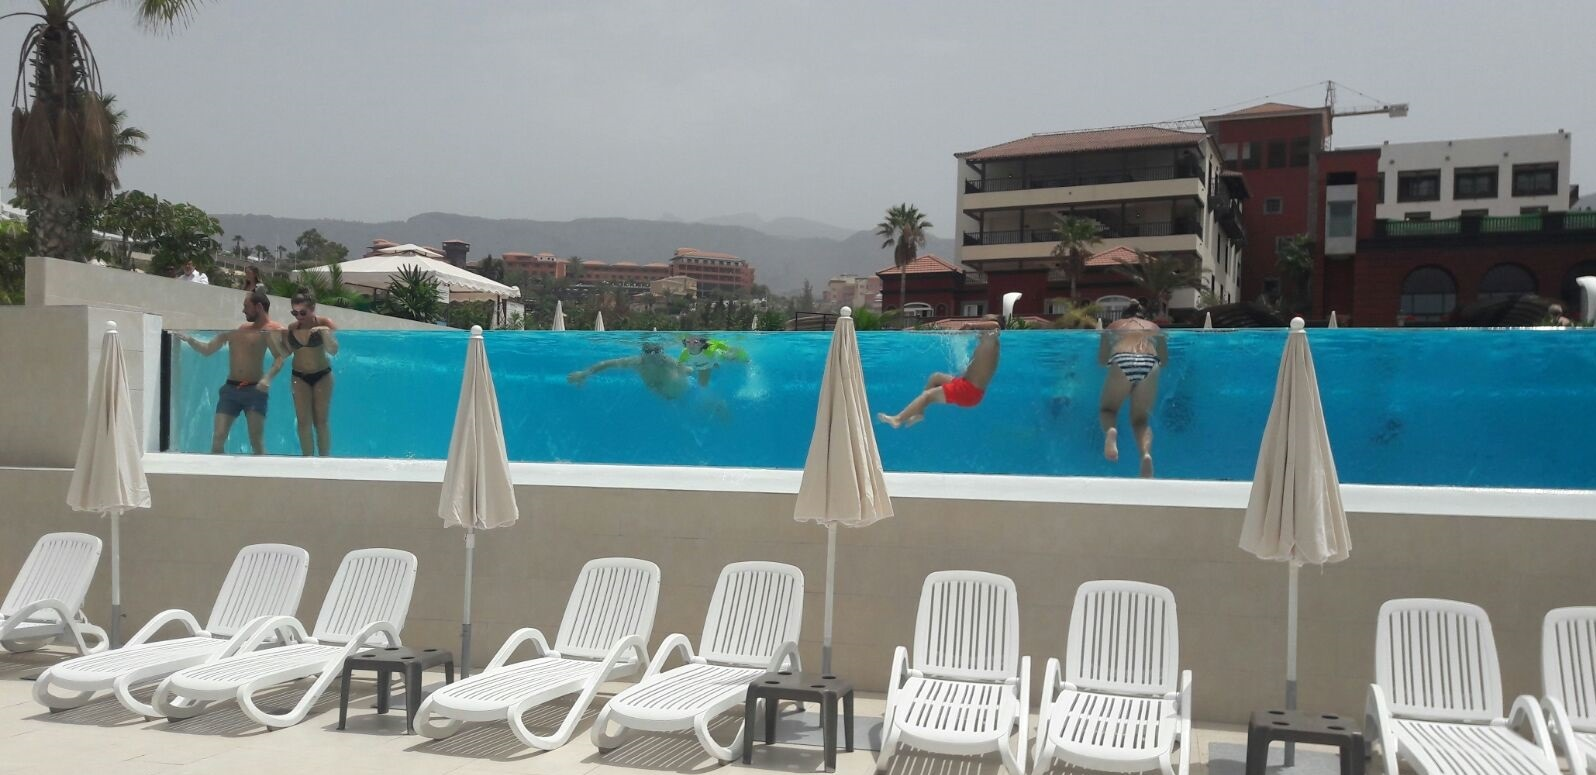 Pared-de-piscina-Adeje-Tenerife